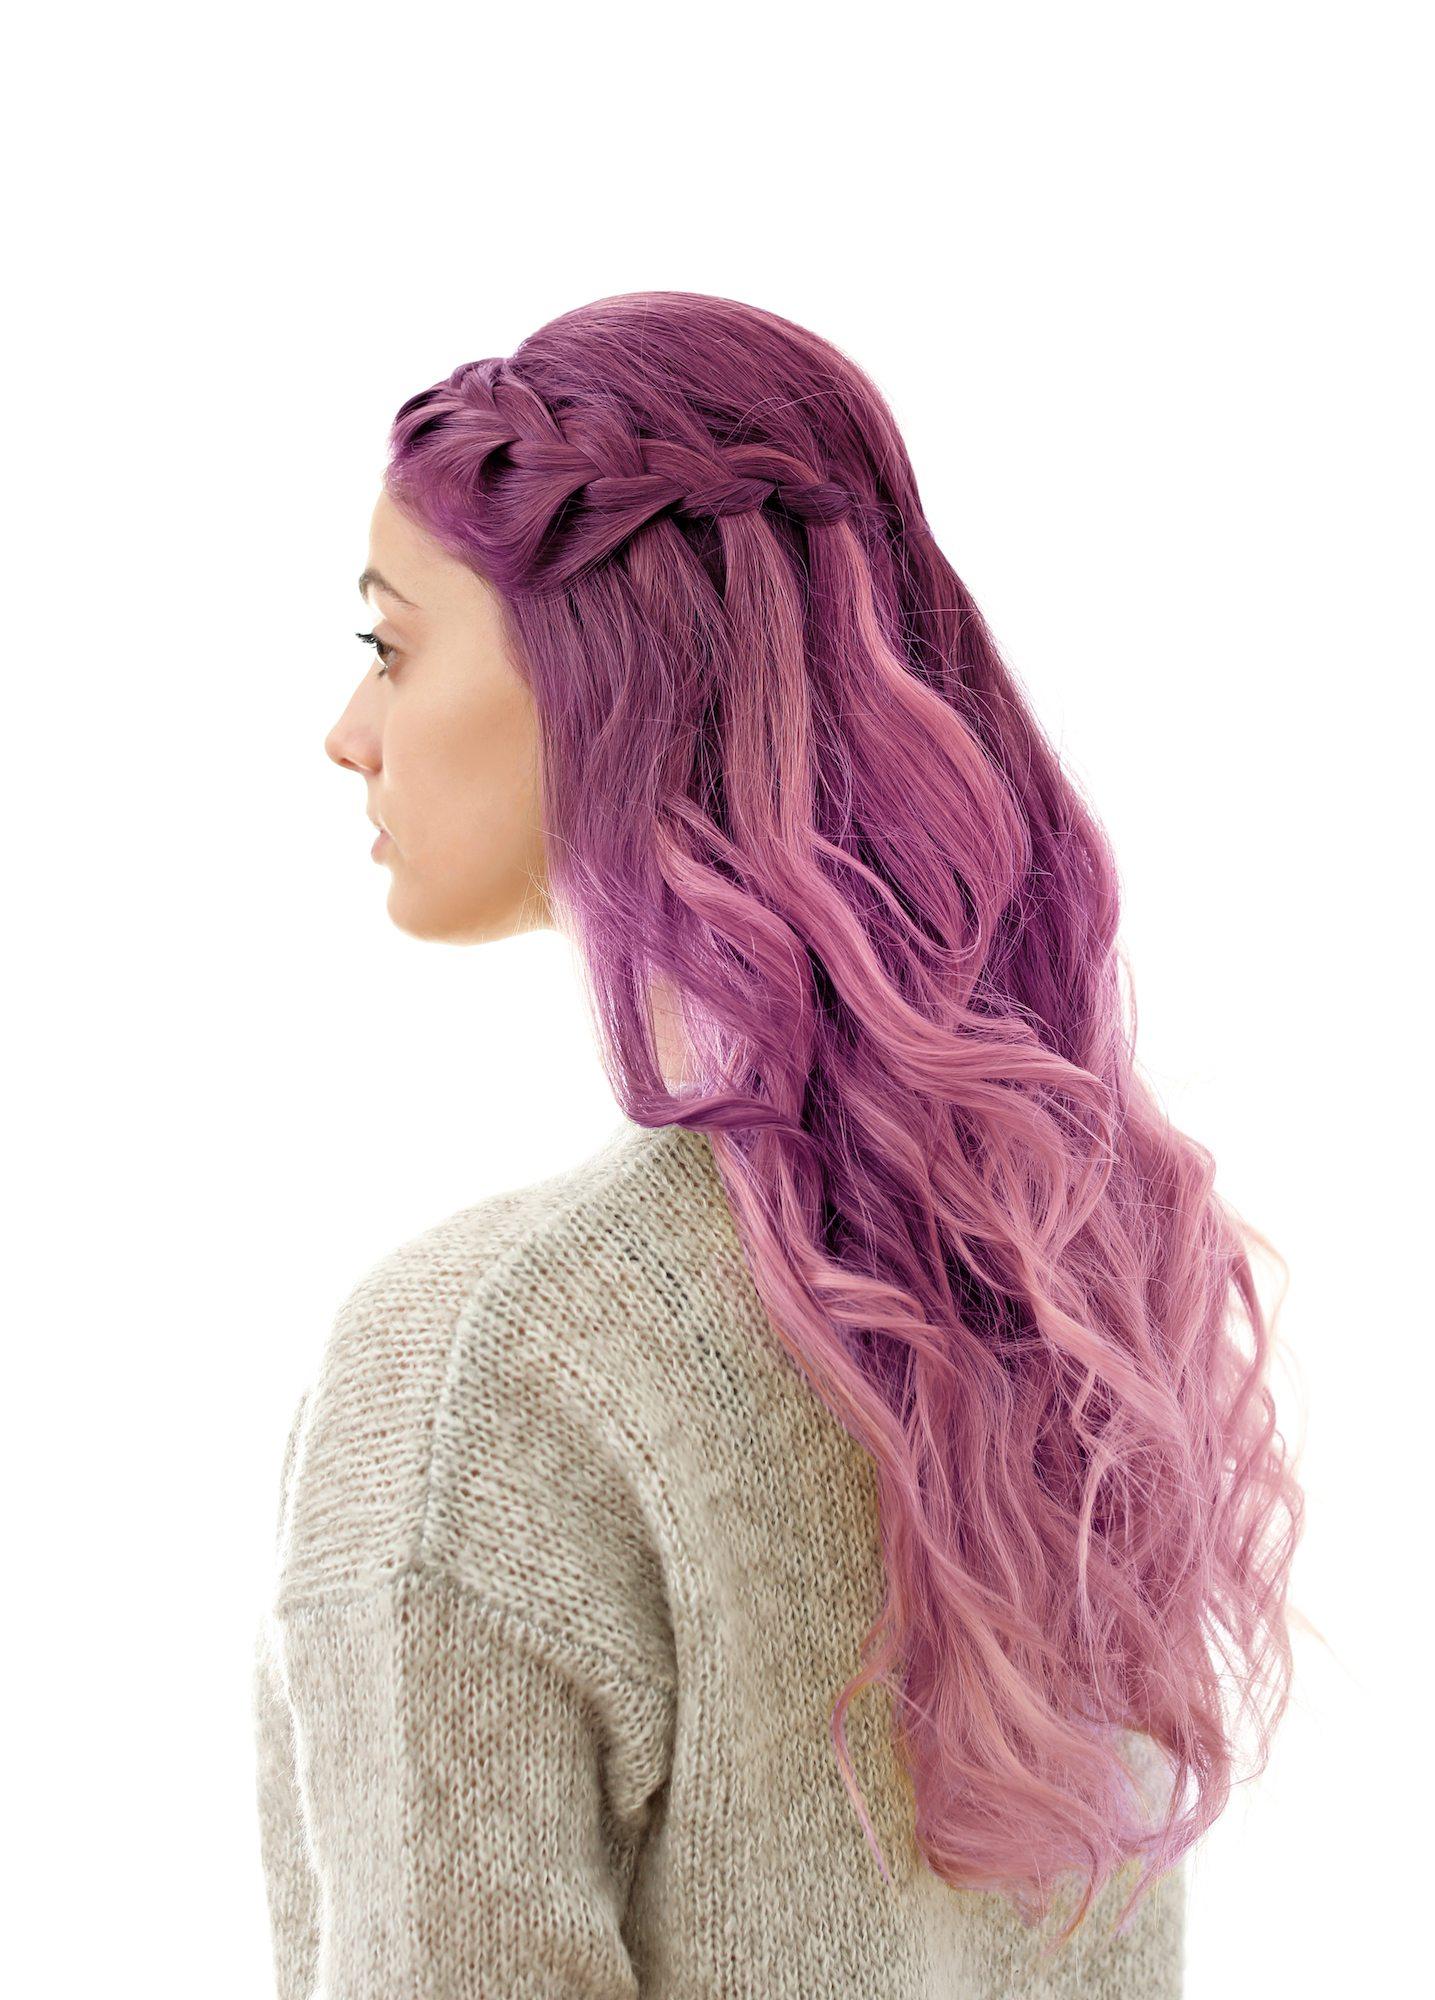 Half french braid panjang ikal tatanan rambut panjang sehari-hari.